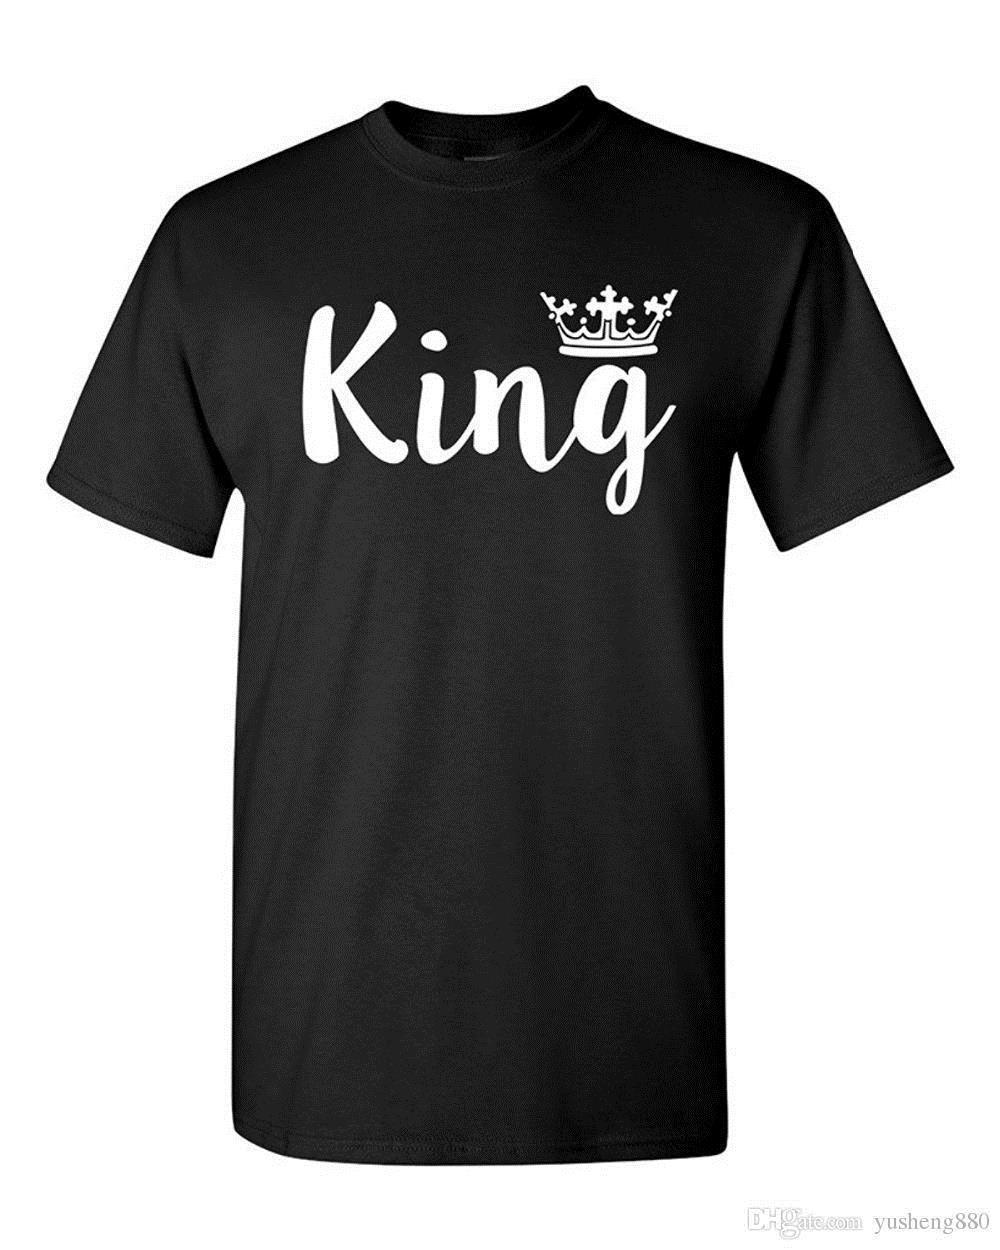 d53d801fb5 Shirt Design Website Design Men Crew Neck King Crown Couple Love Matching  Relationship Funny DT Adult T Shirt Tee Short Sleeve Cool T Shirts For Boys  Online ...